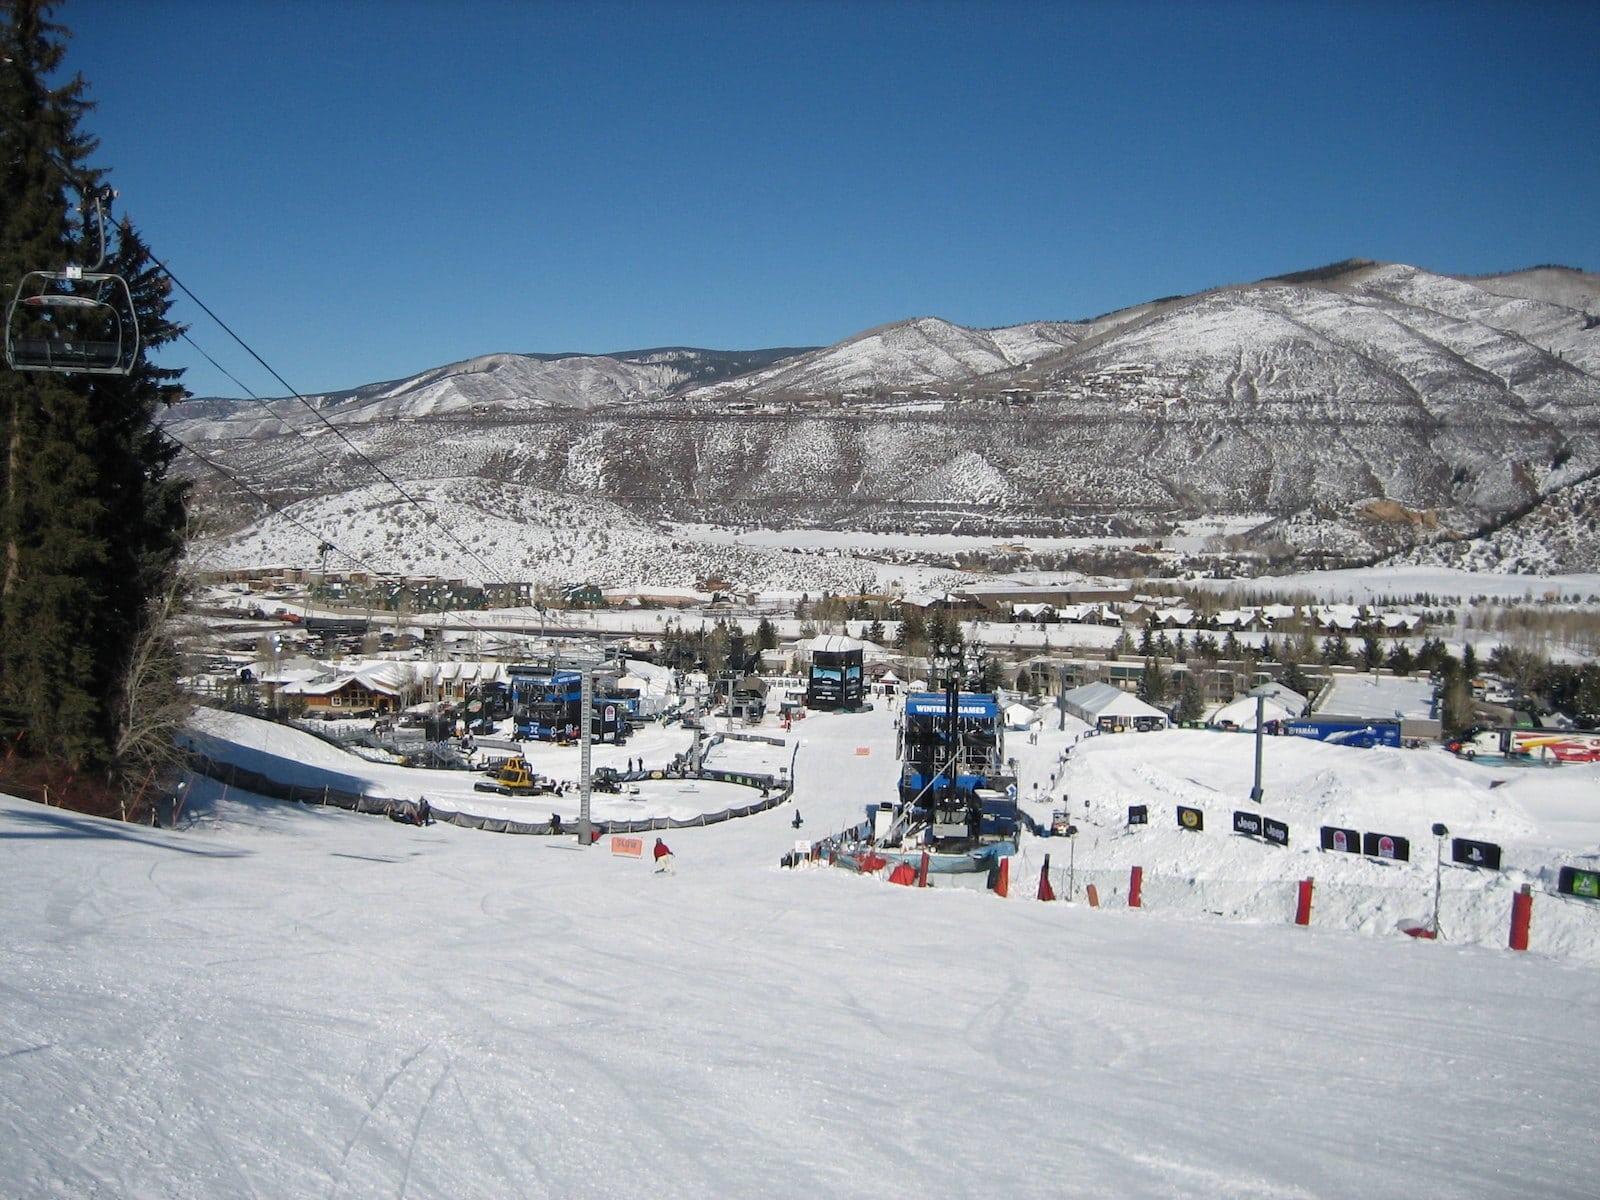 Image of Buttermilk Mountain in Aspen, Colorado